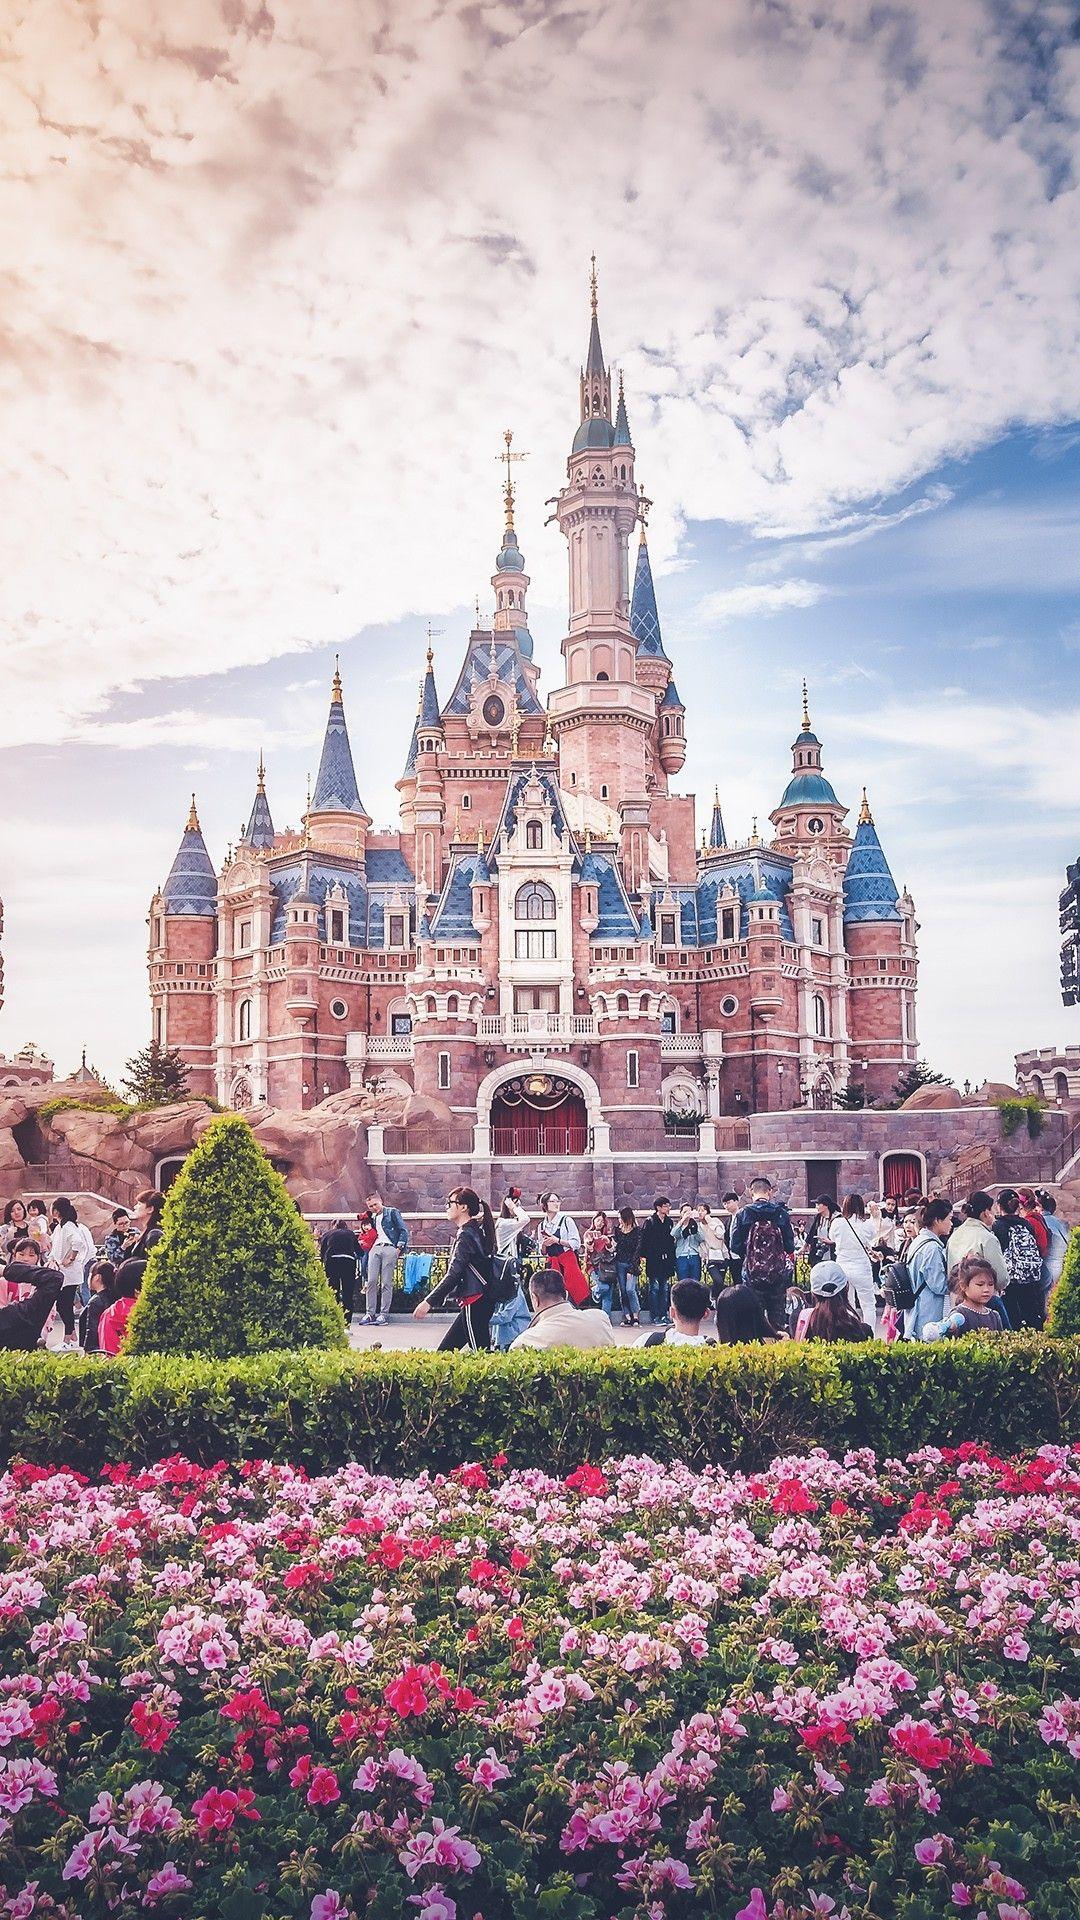 Pin By Harshita Gautam On Wallpapers Disney World Castle Disney World Pictures Disney Background